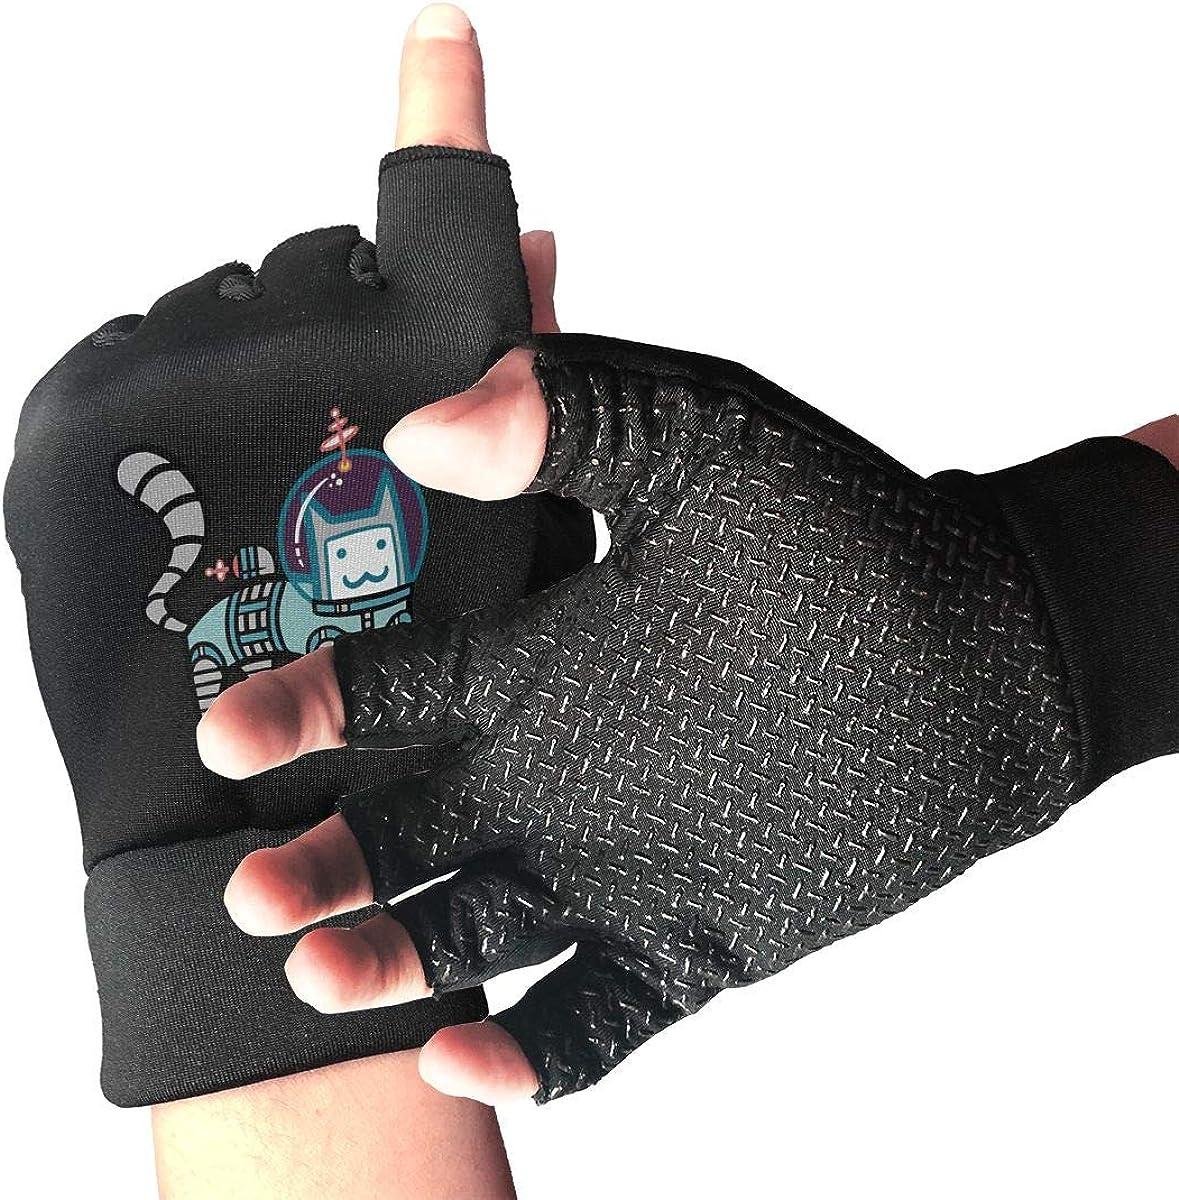 Gloves Astro Cat Fingerless Gloves Short Touchscreen Gloves Winter Motorcycle Biker Mitten